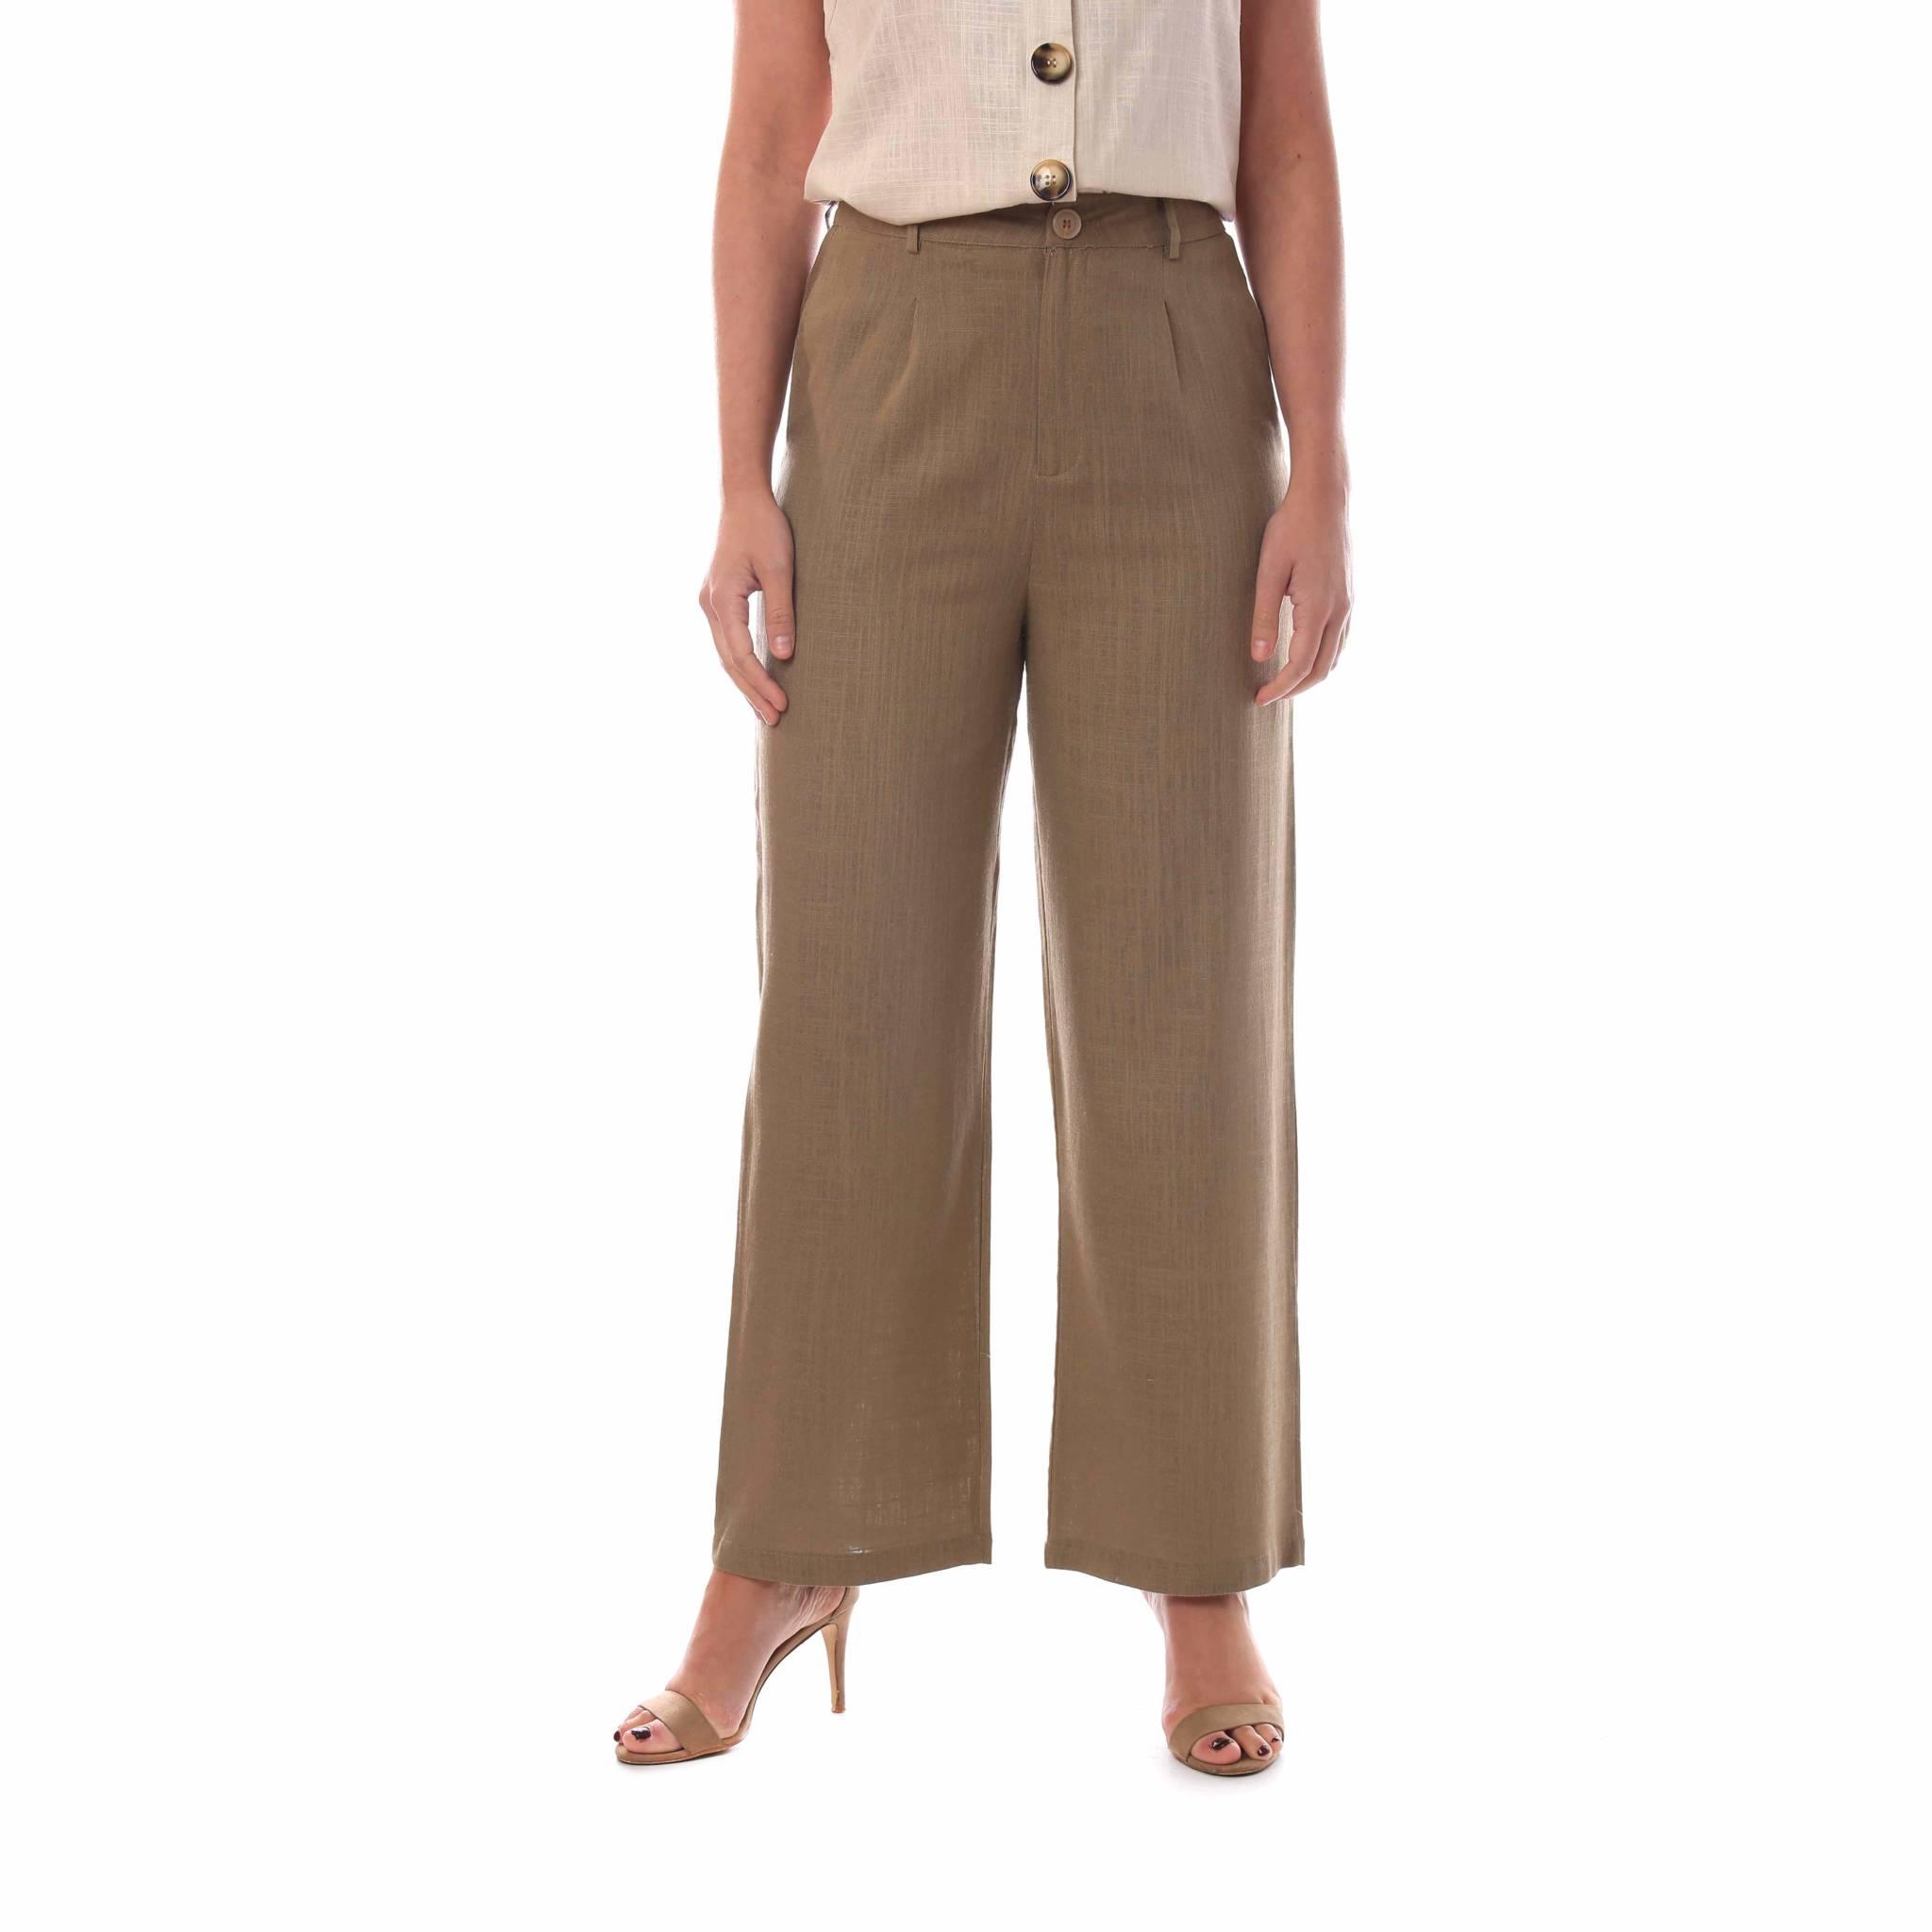 Pantalon Fluido Mezcla Link Con Pernera Ancha Le Cocco